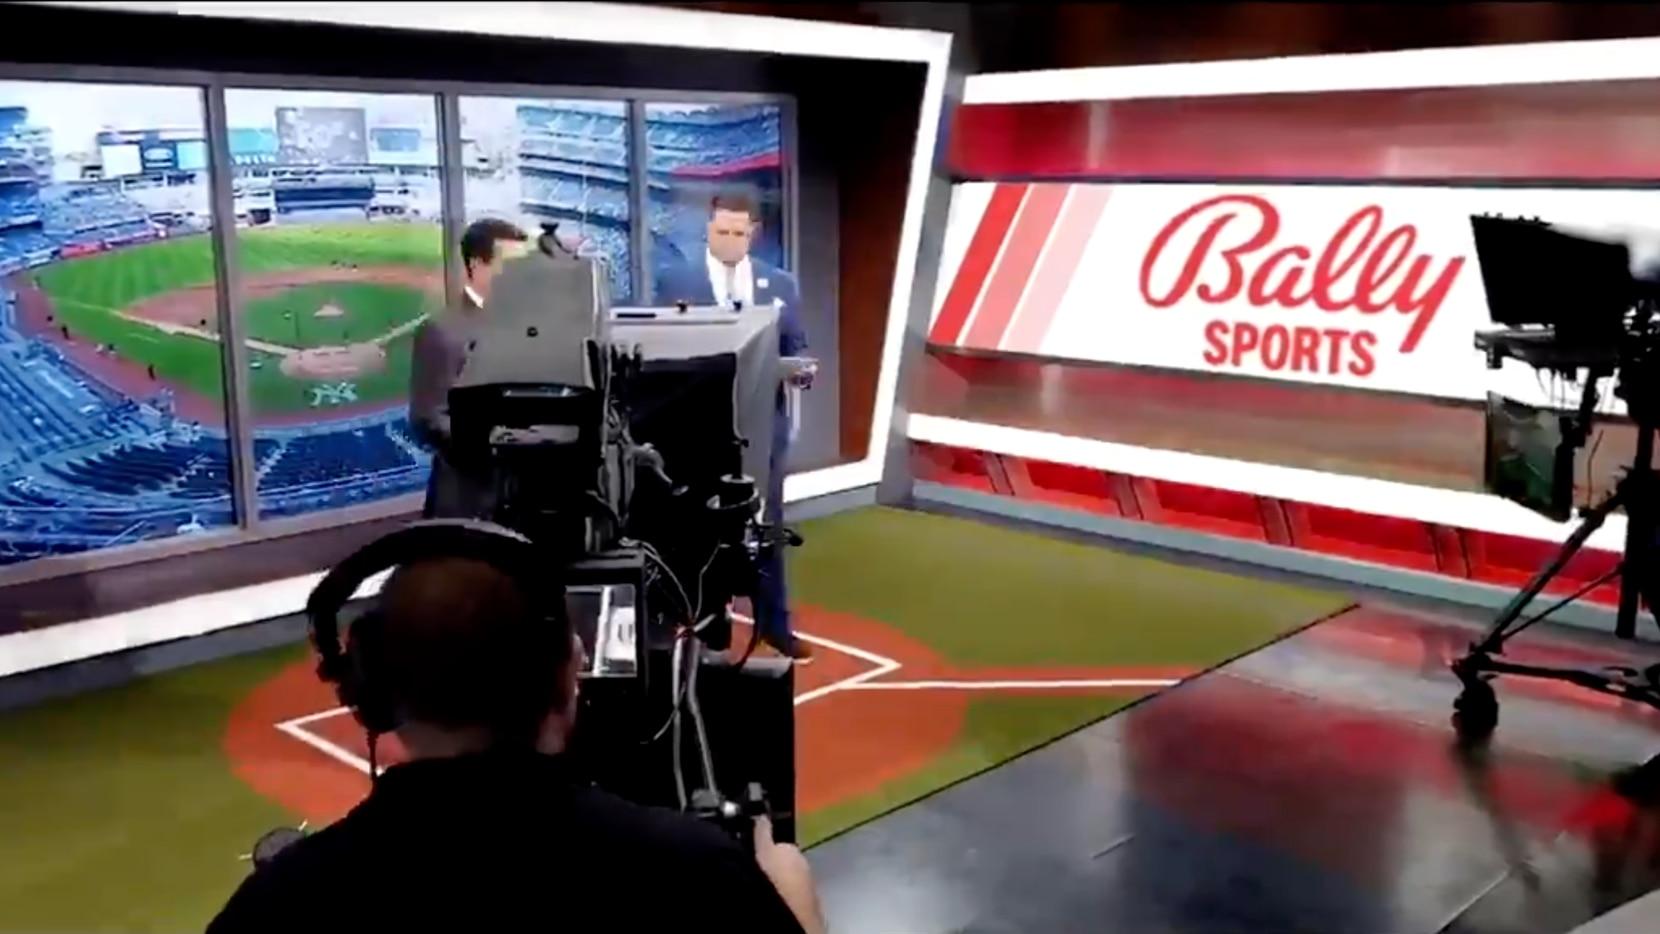 Fox Regional Sports Networks, que incluye Fox Sports Southwest, ha cambiado su nombre a Bally Sports.